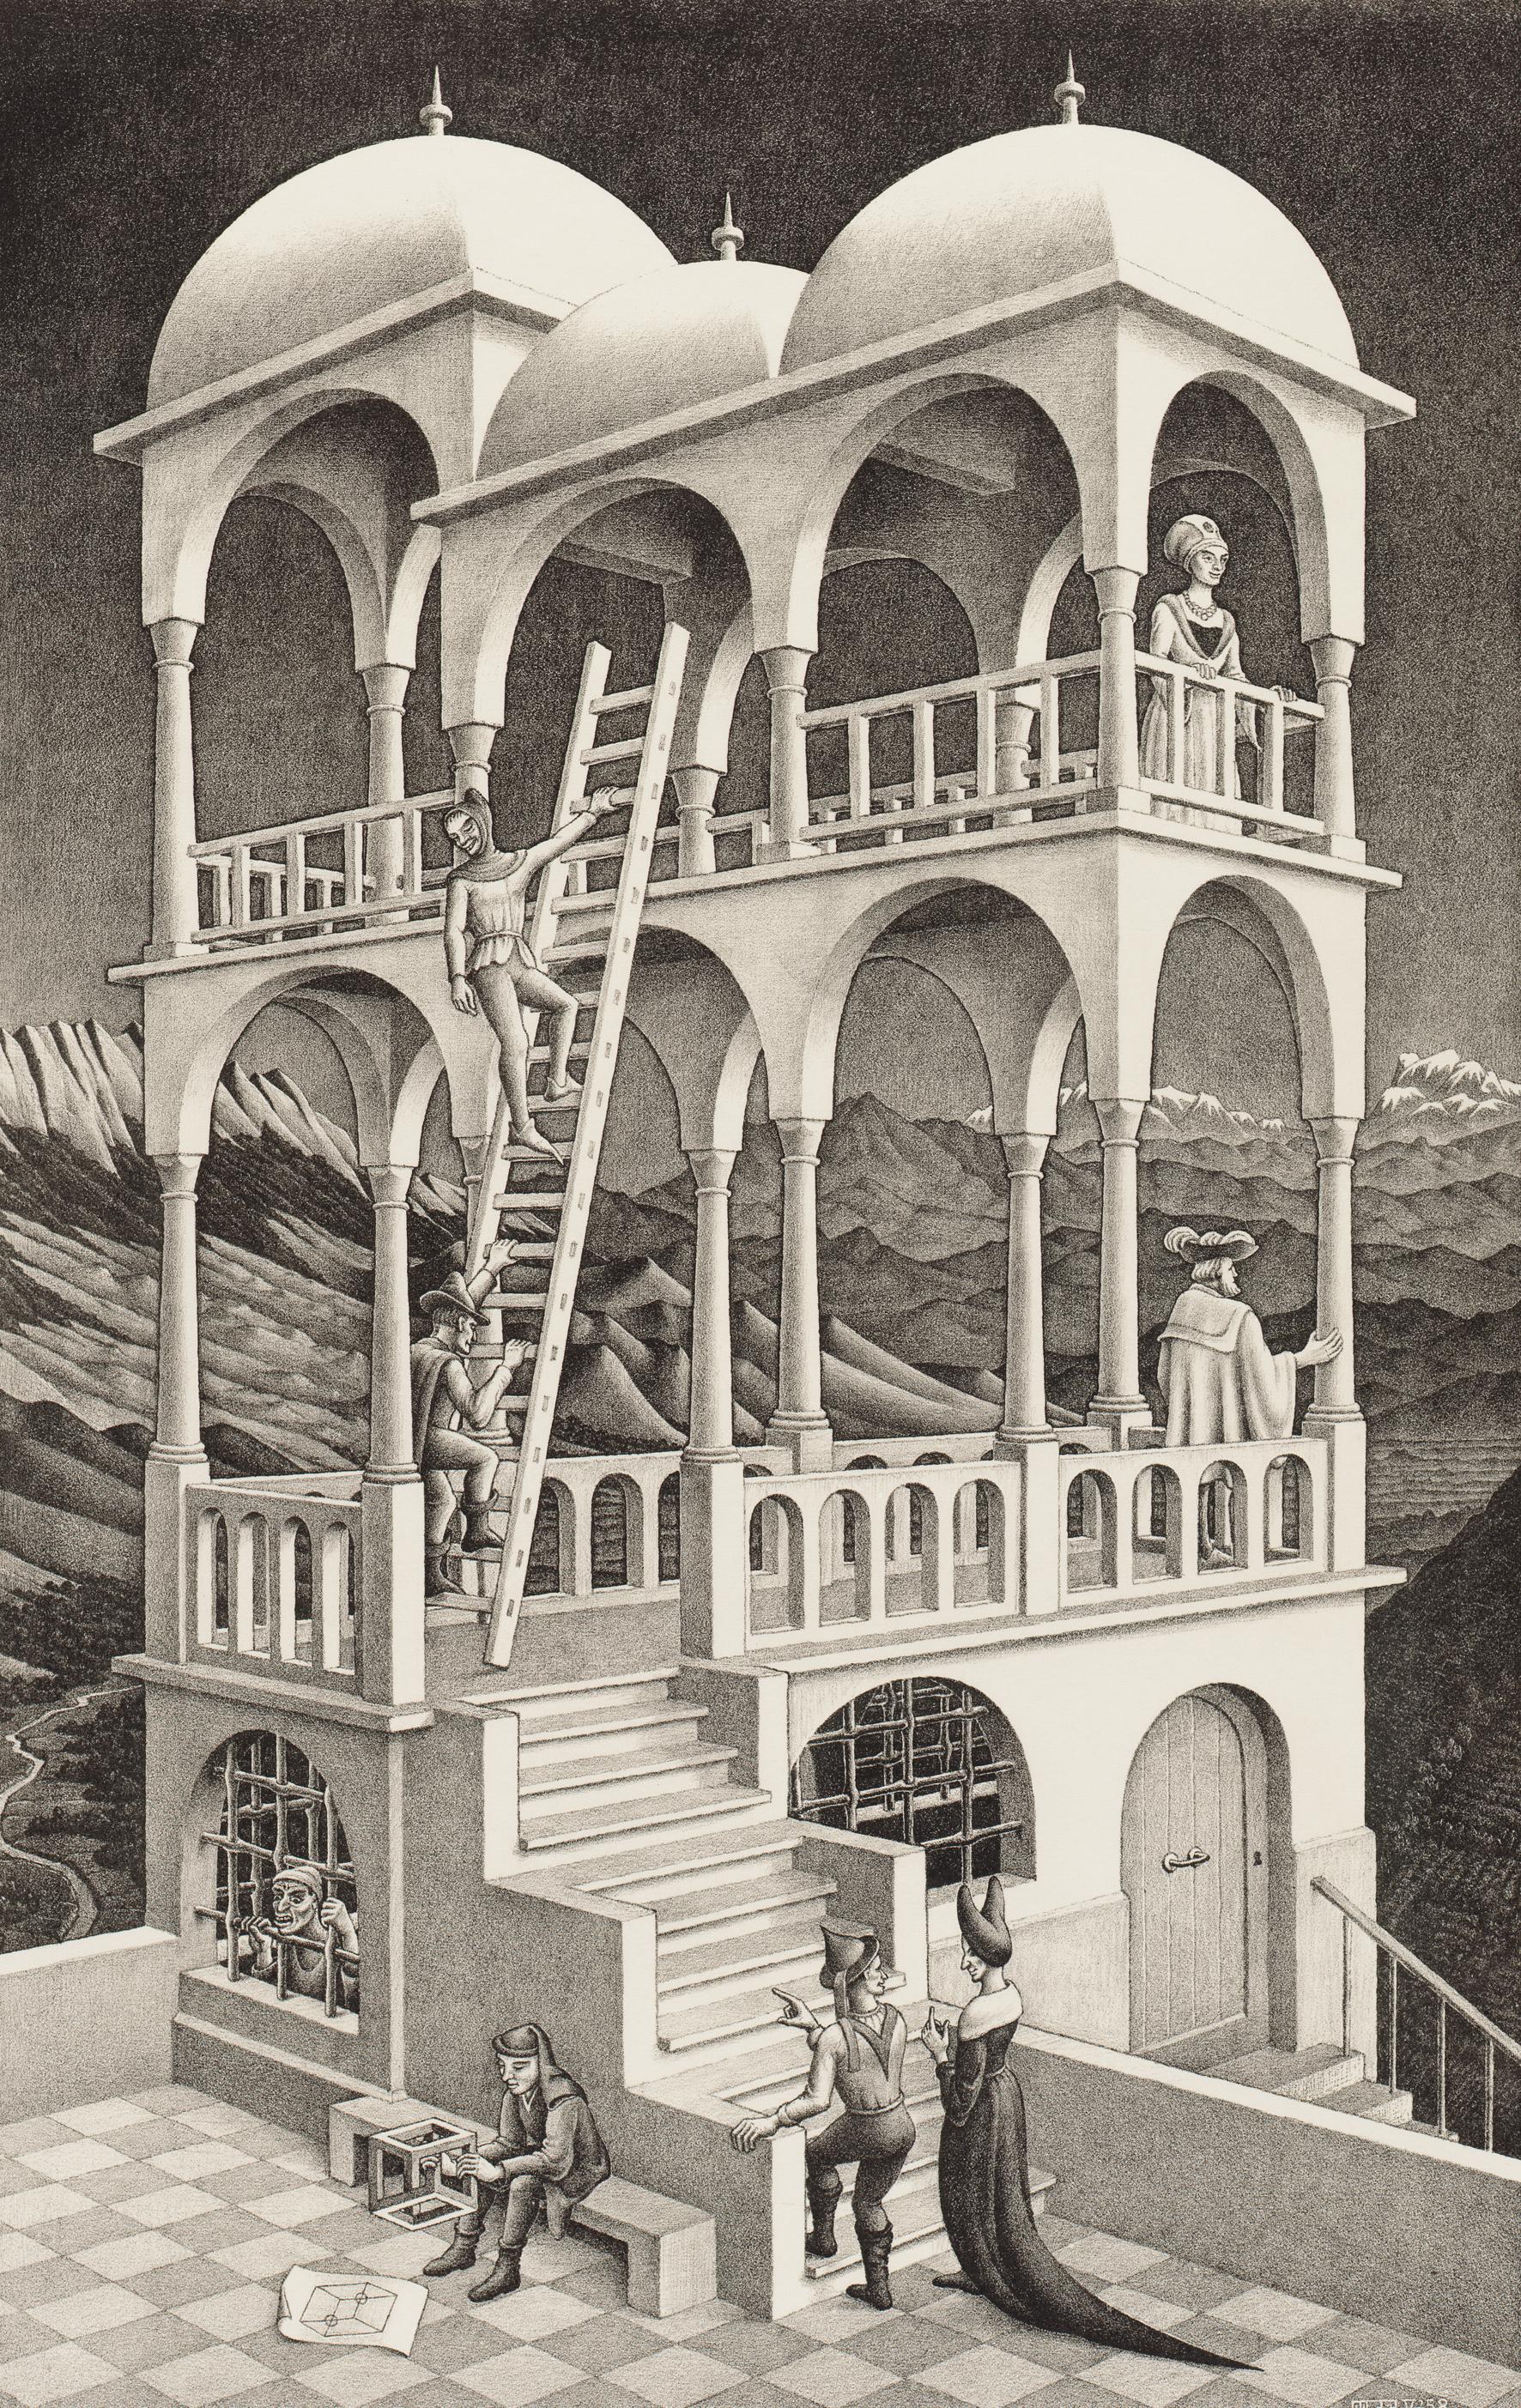 Belvedere. M.C. Escher (1958)